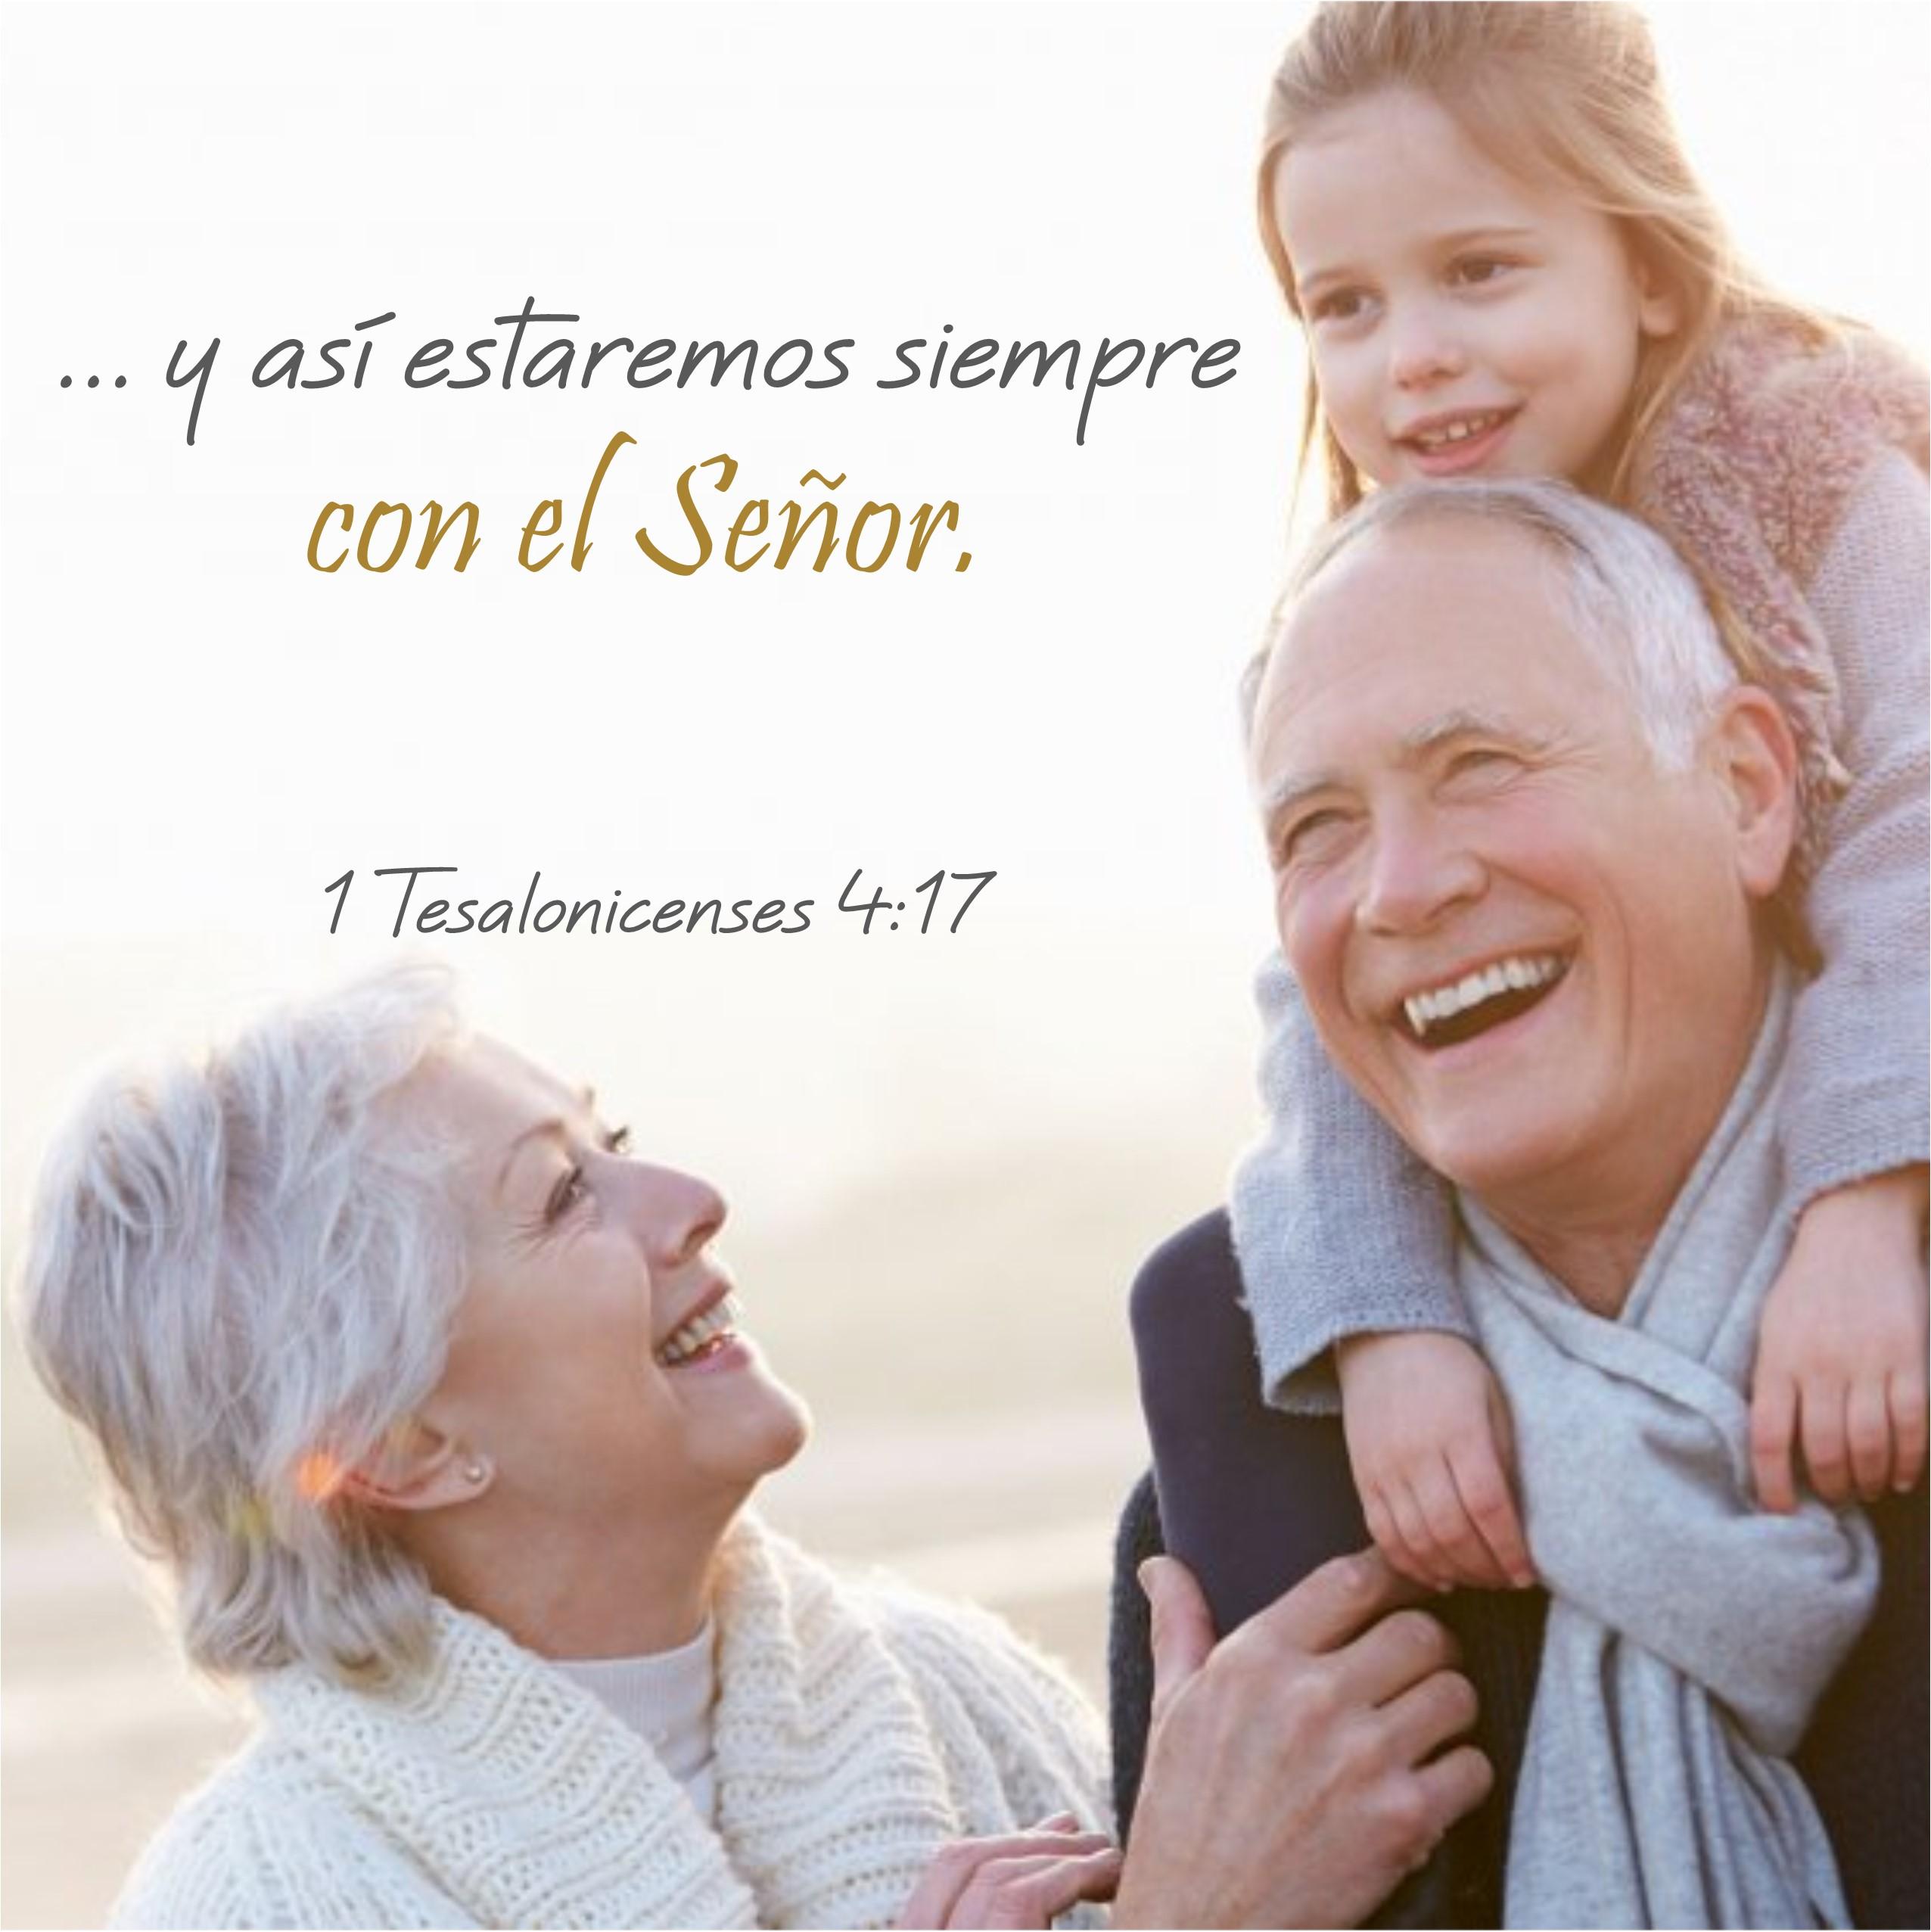 1 Tesalonicenses 4.17 Anexo